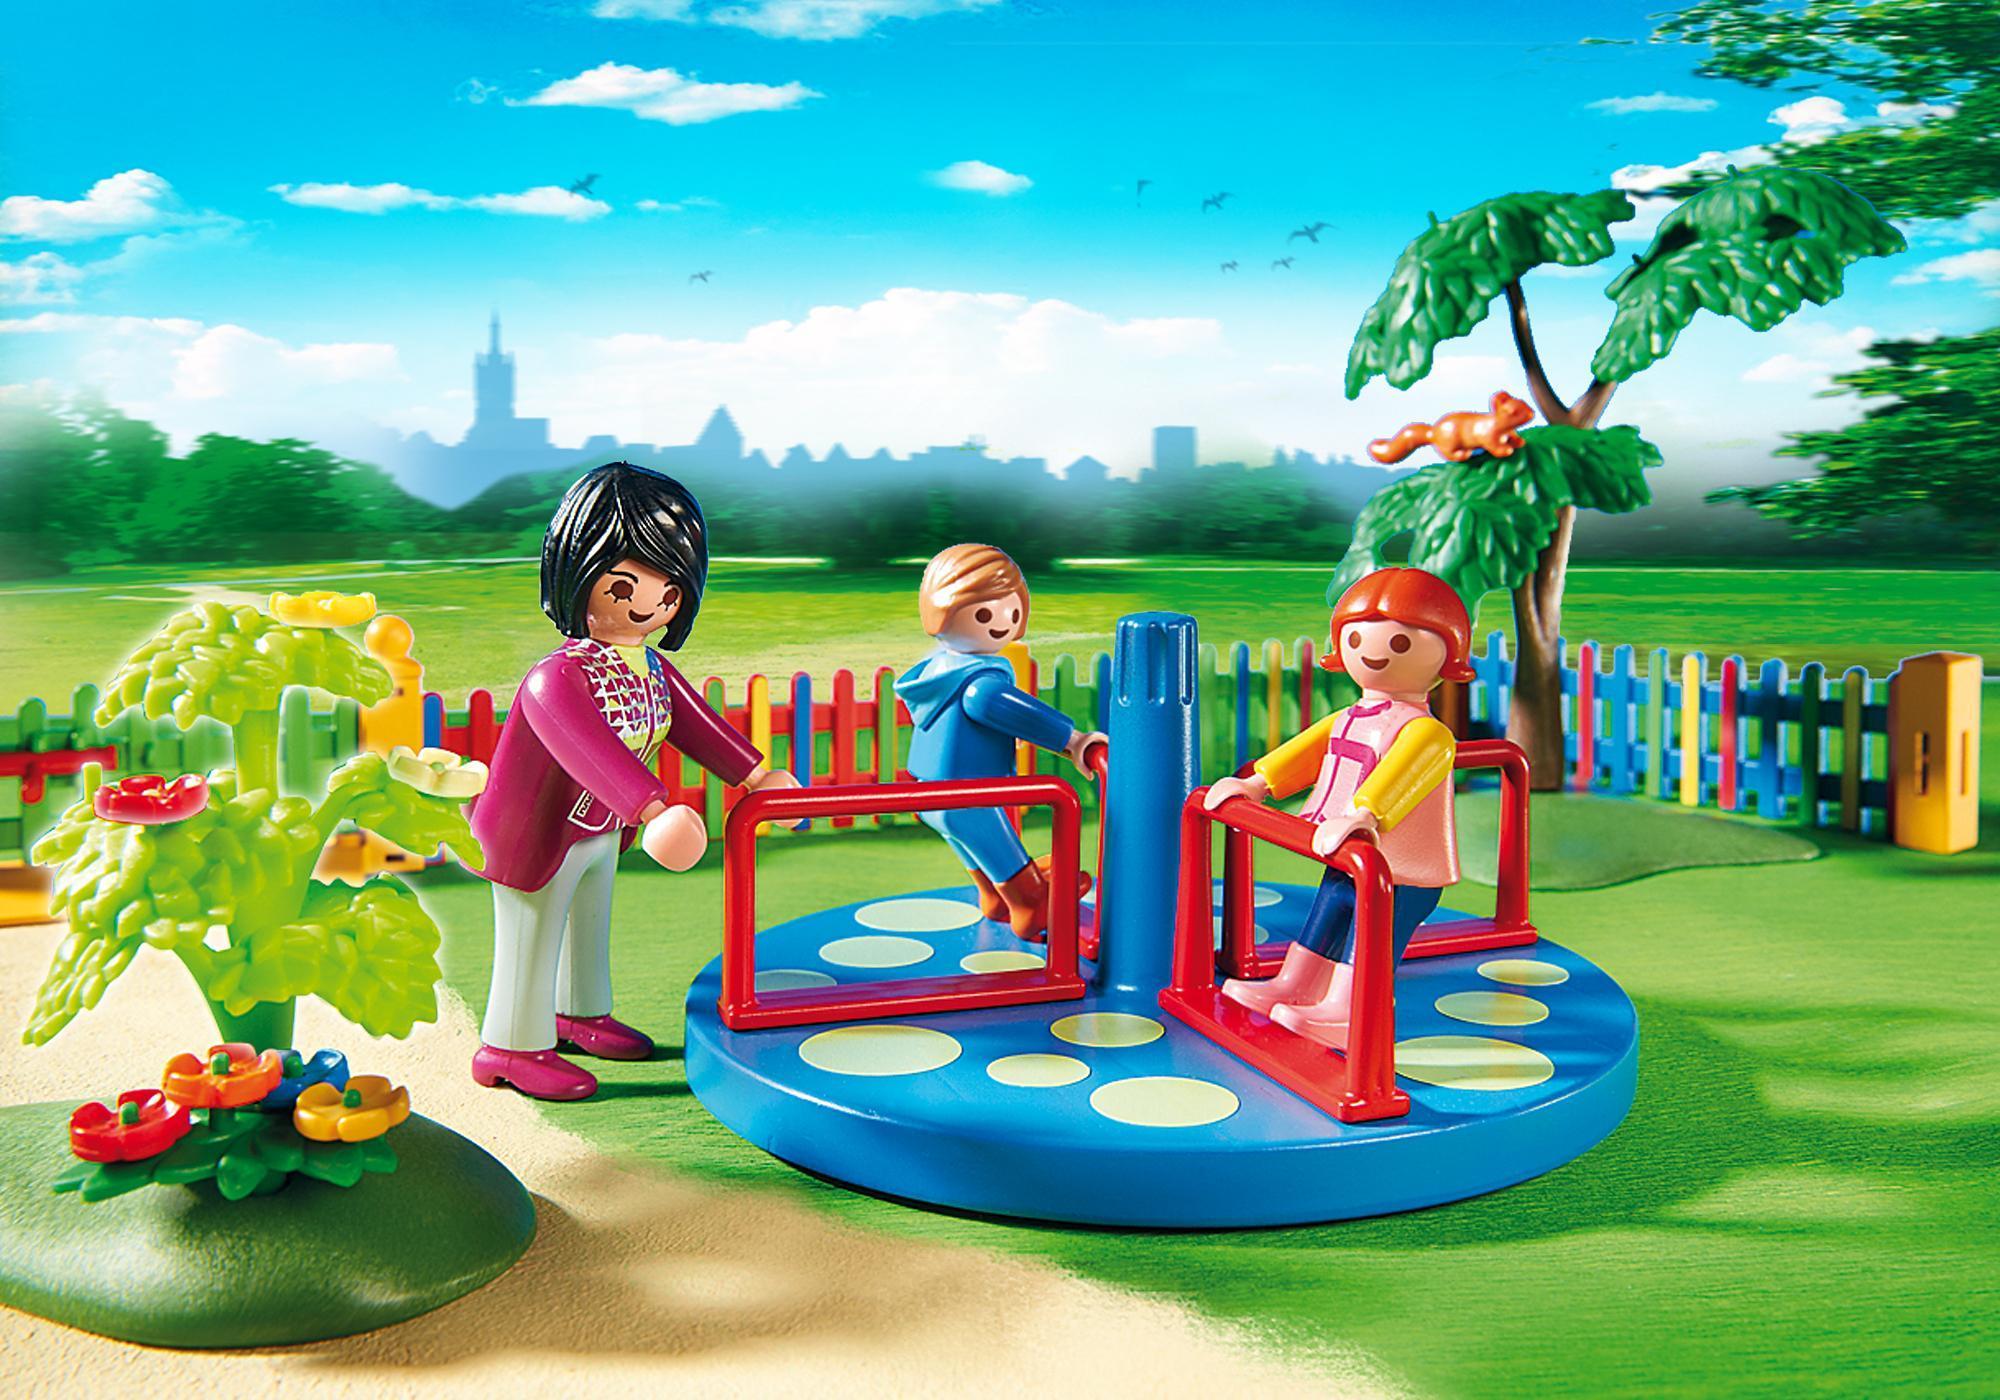 http://media.playmobil.com/i/playmobil/5568_product_extra2/Kinderspielplatz